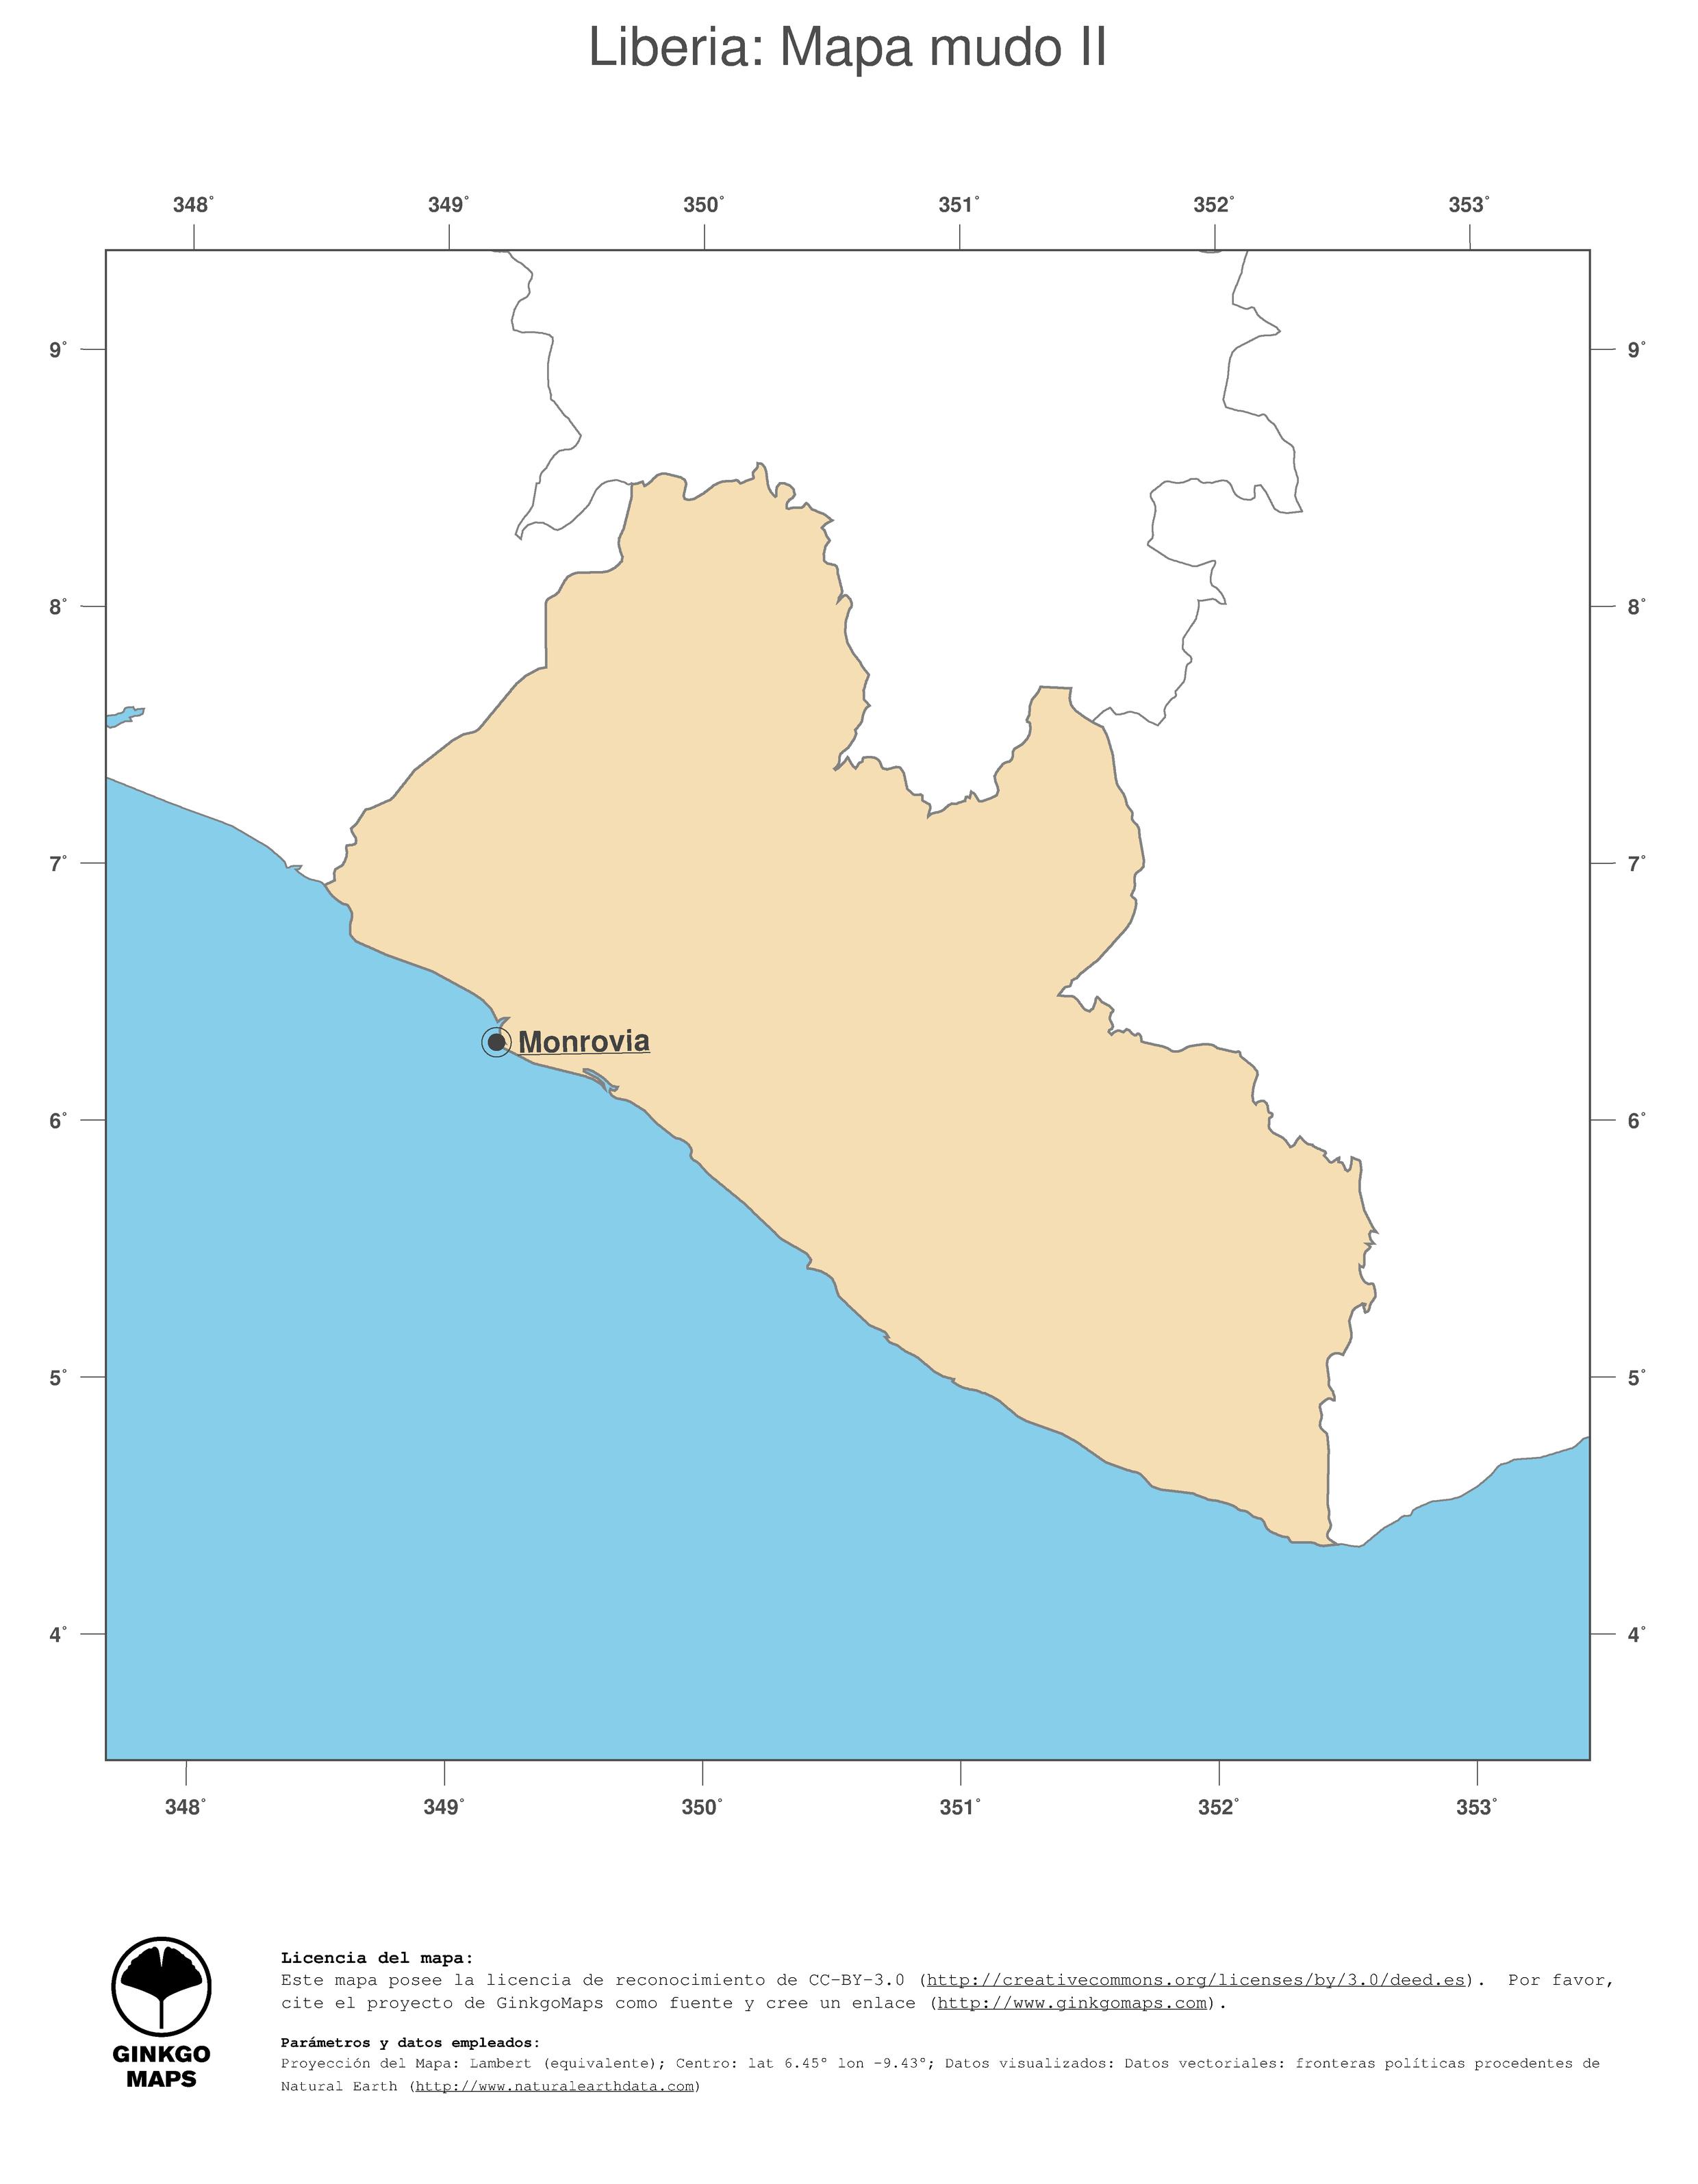 Worksheet. Mapa Liberia mapas coleccin continente frica record Liberia